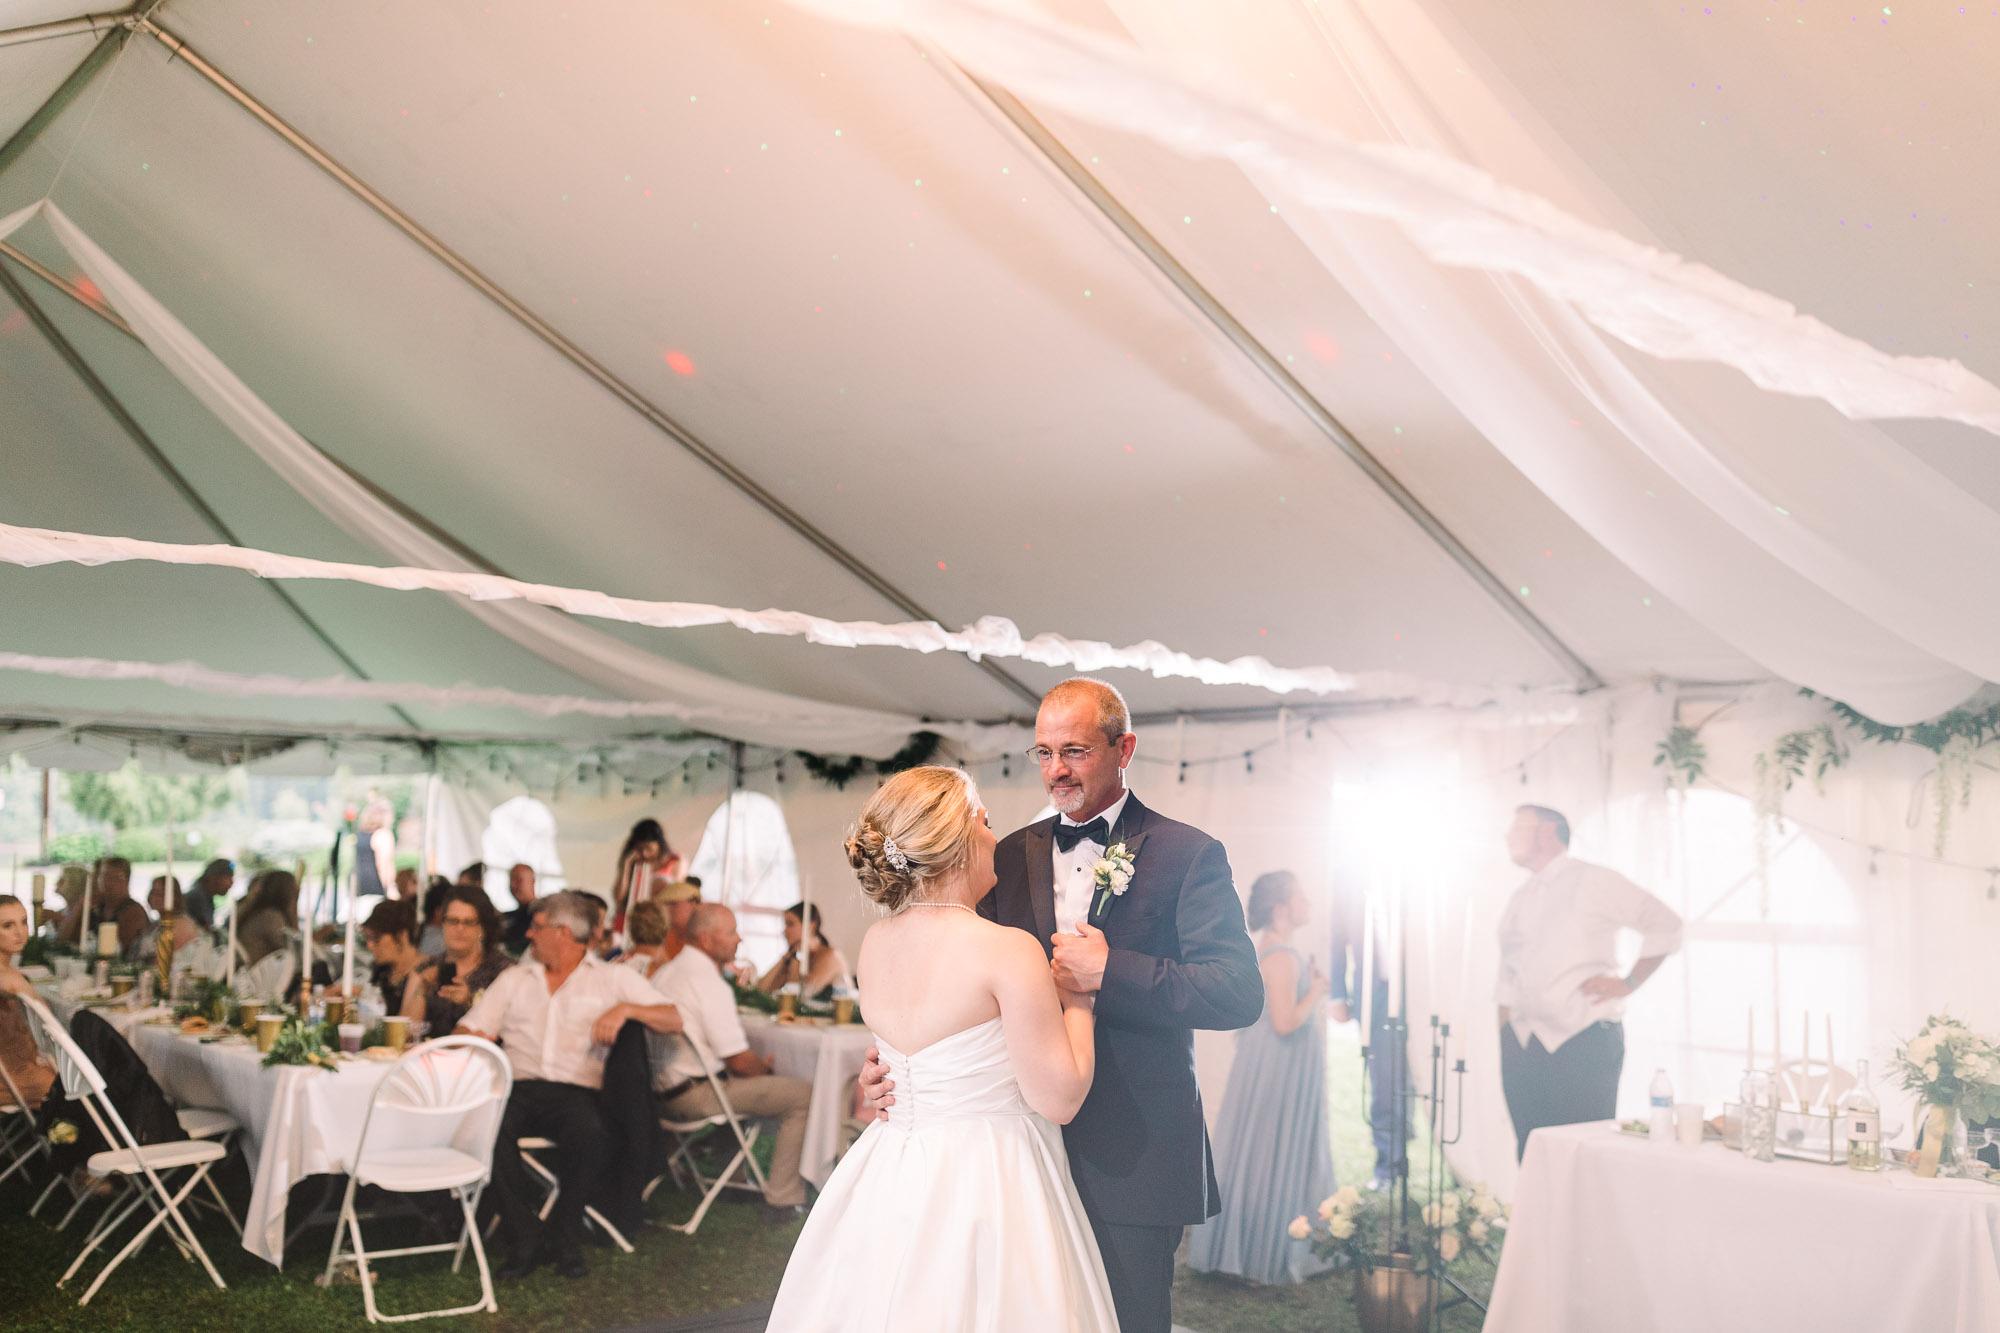 isle-of-que-wedding-7291.jpg